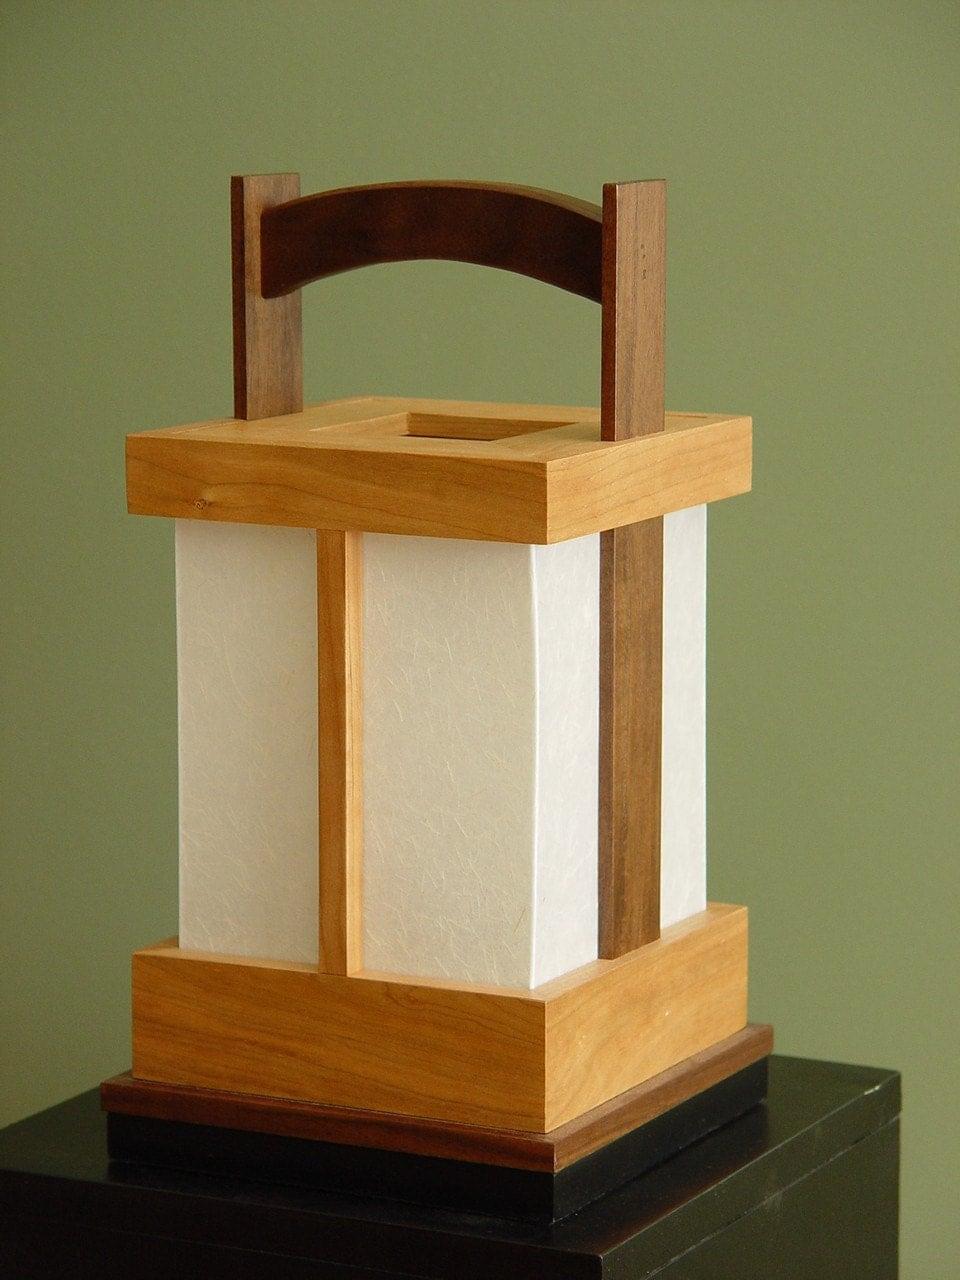 Japanesestyle Shoji Lamp  Walnut/Cherry by takumidesigns24 on Etsy from etsy.com